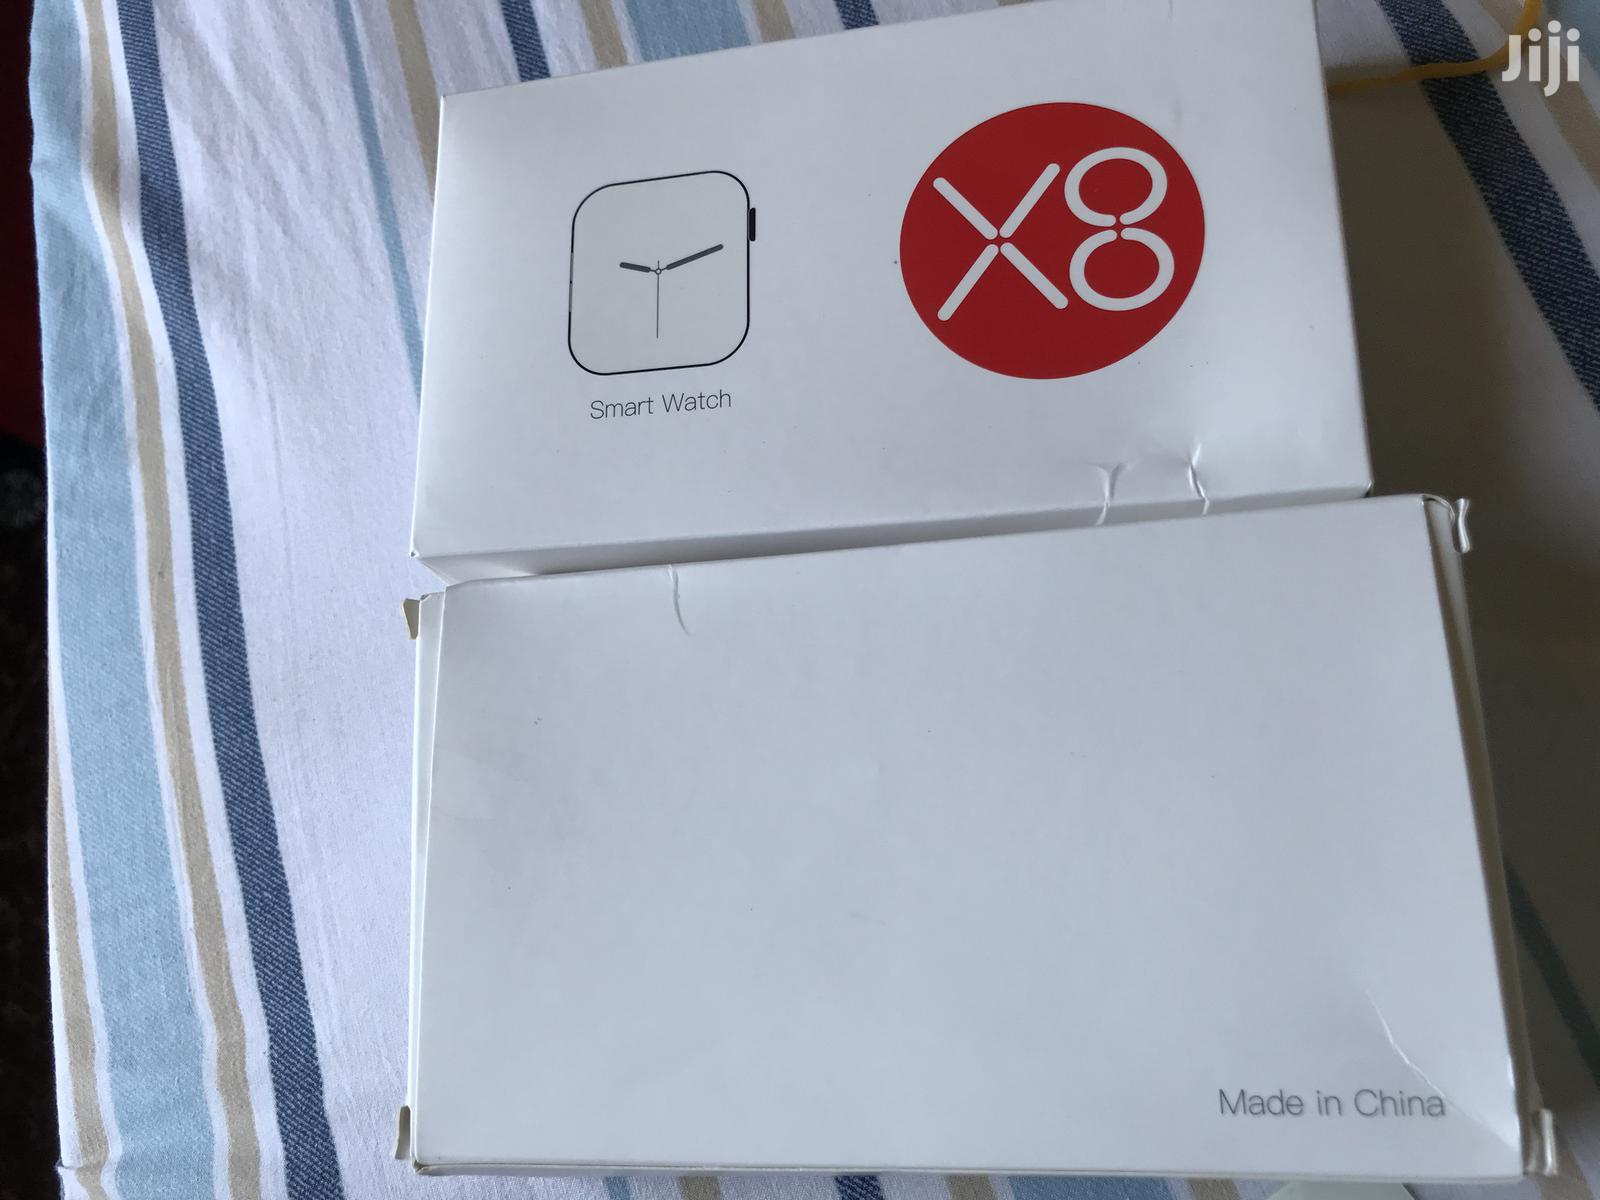 X8 Smart Watch